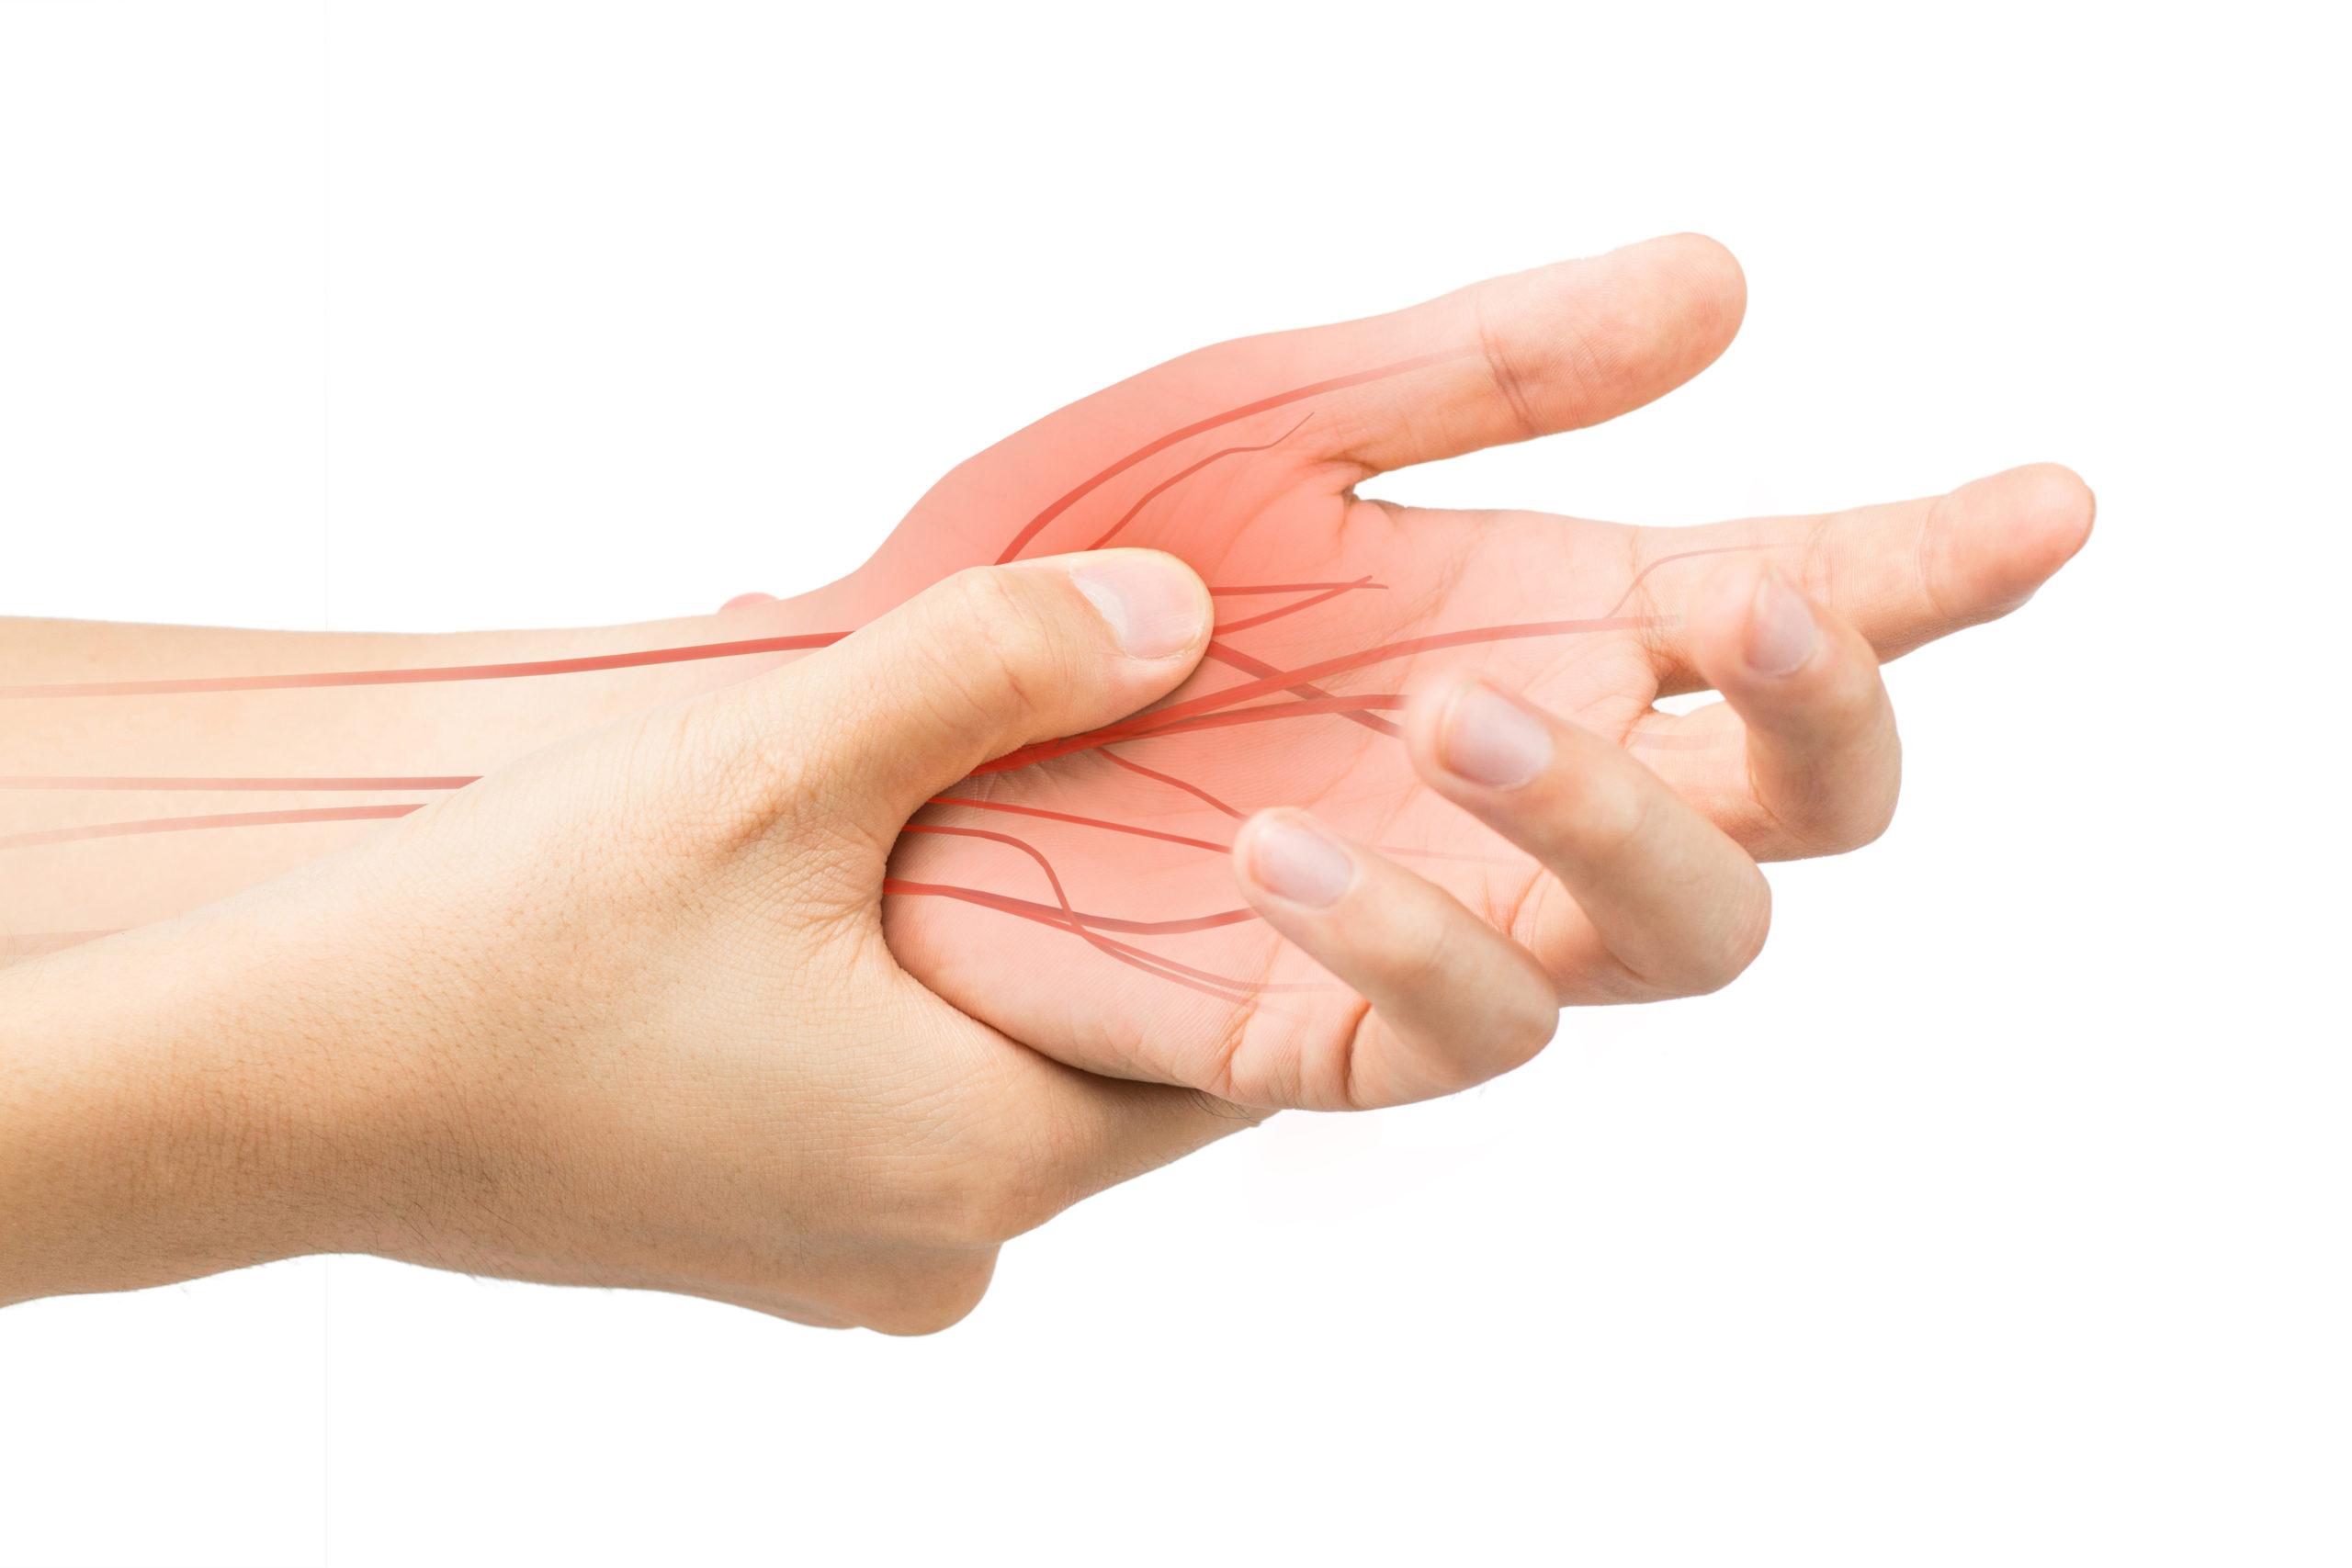 Nerve or neural mobilisation in the hand